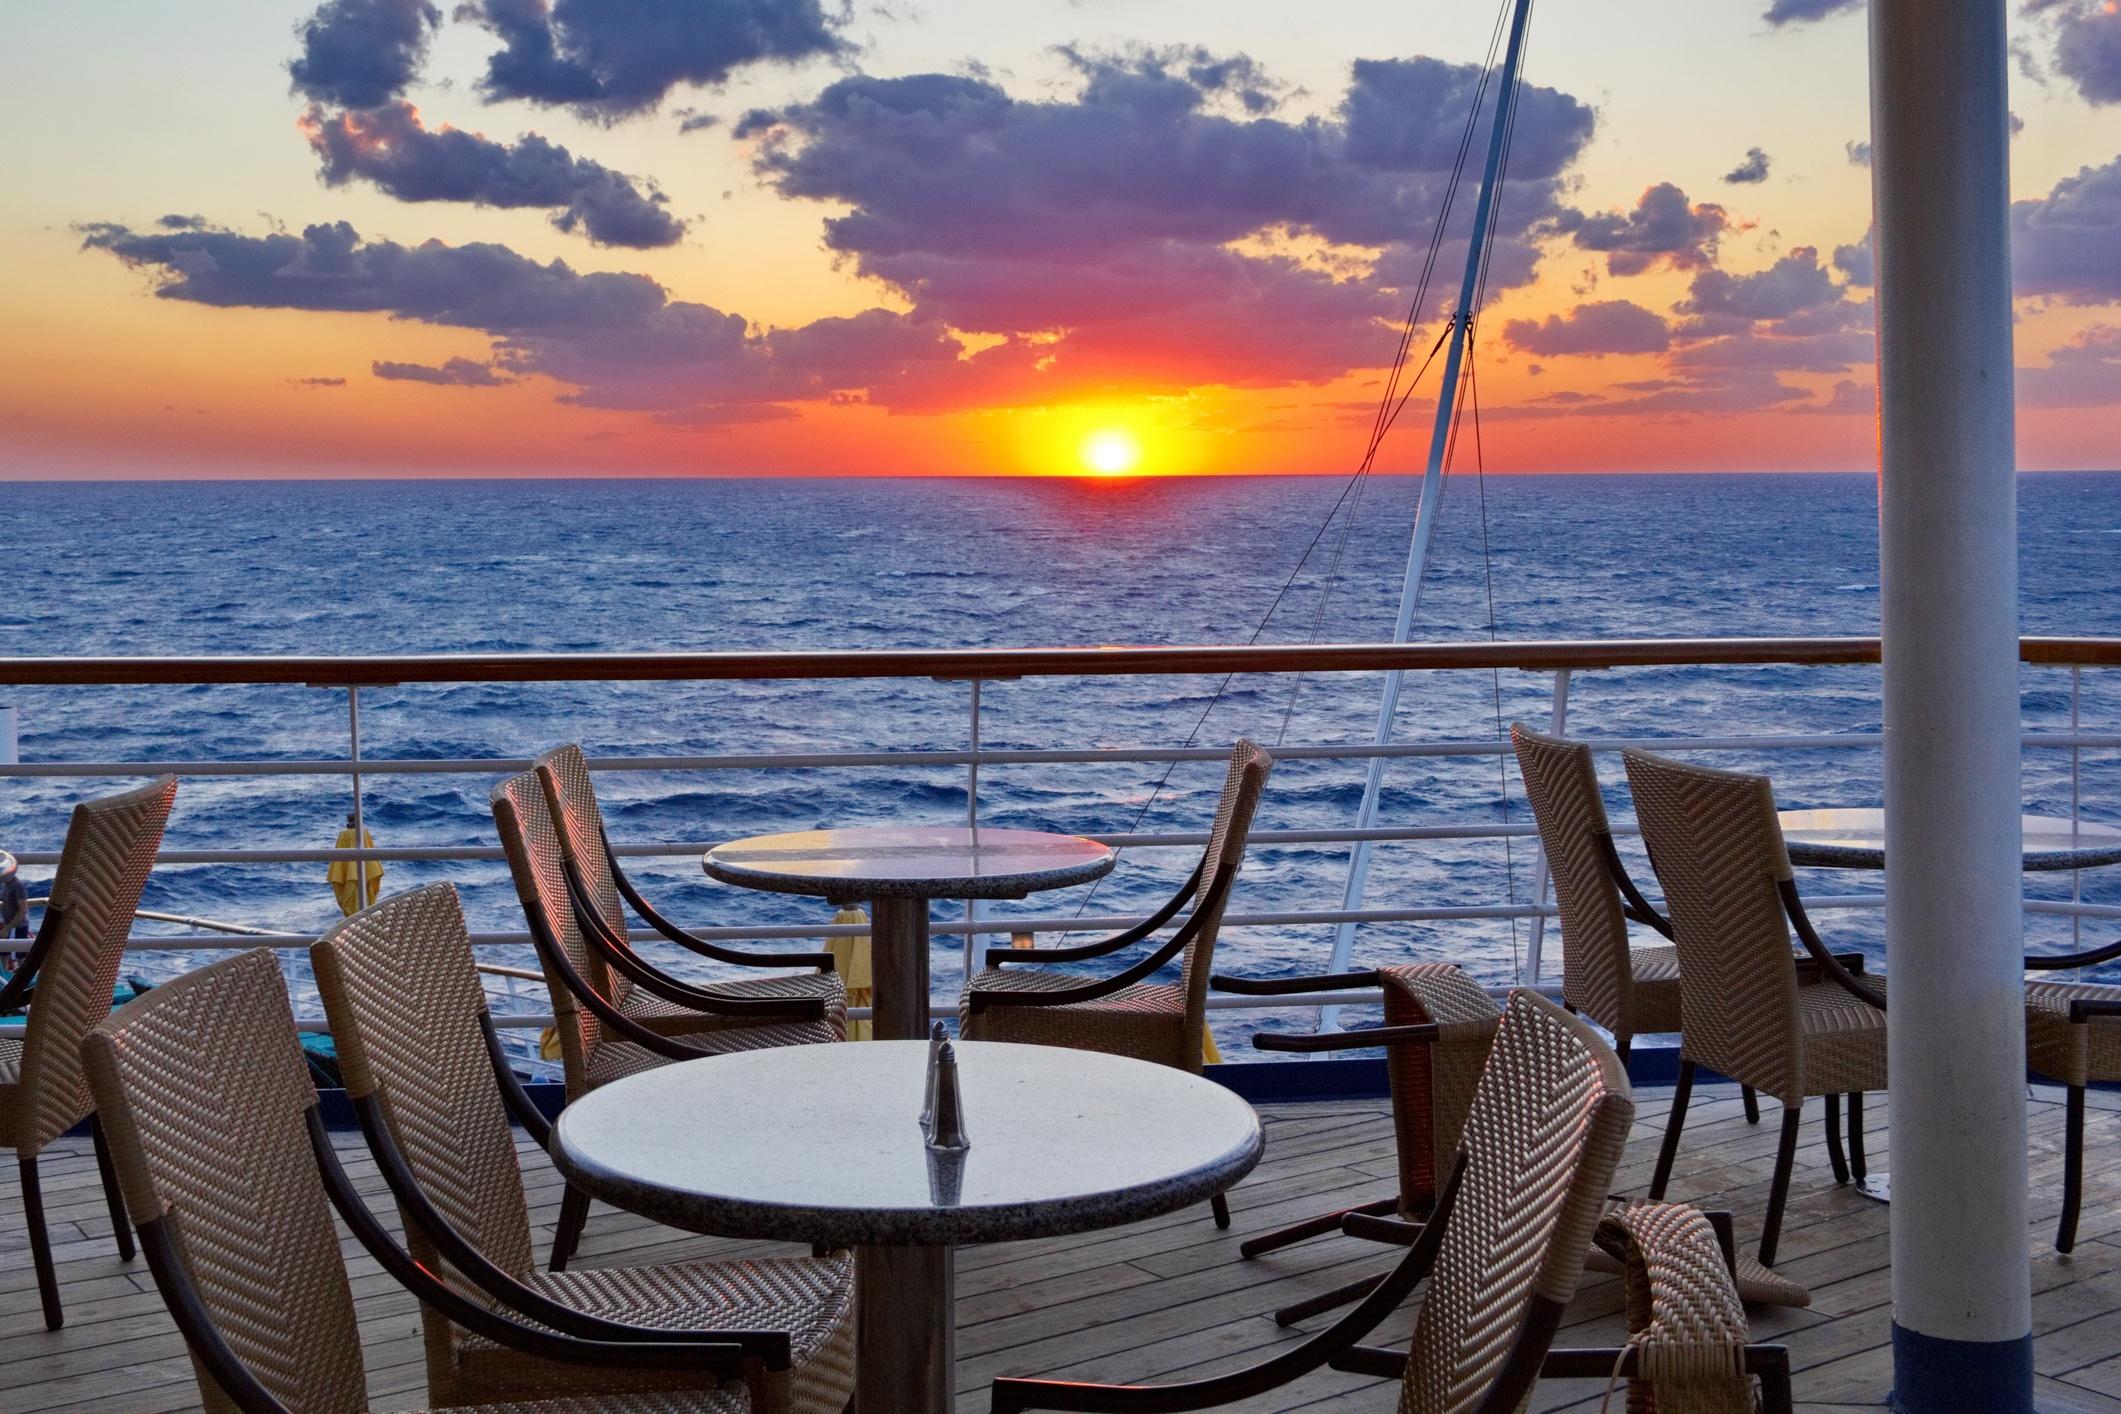 cruise ship dining dock